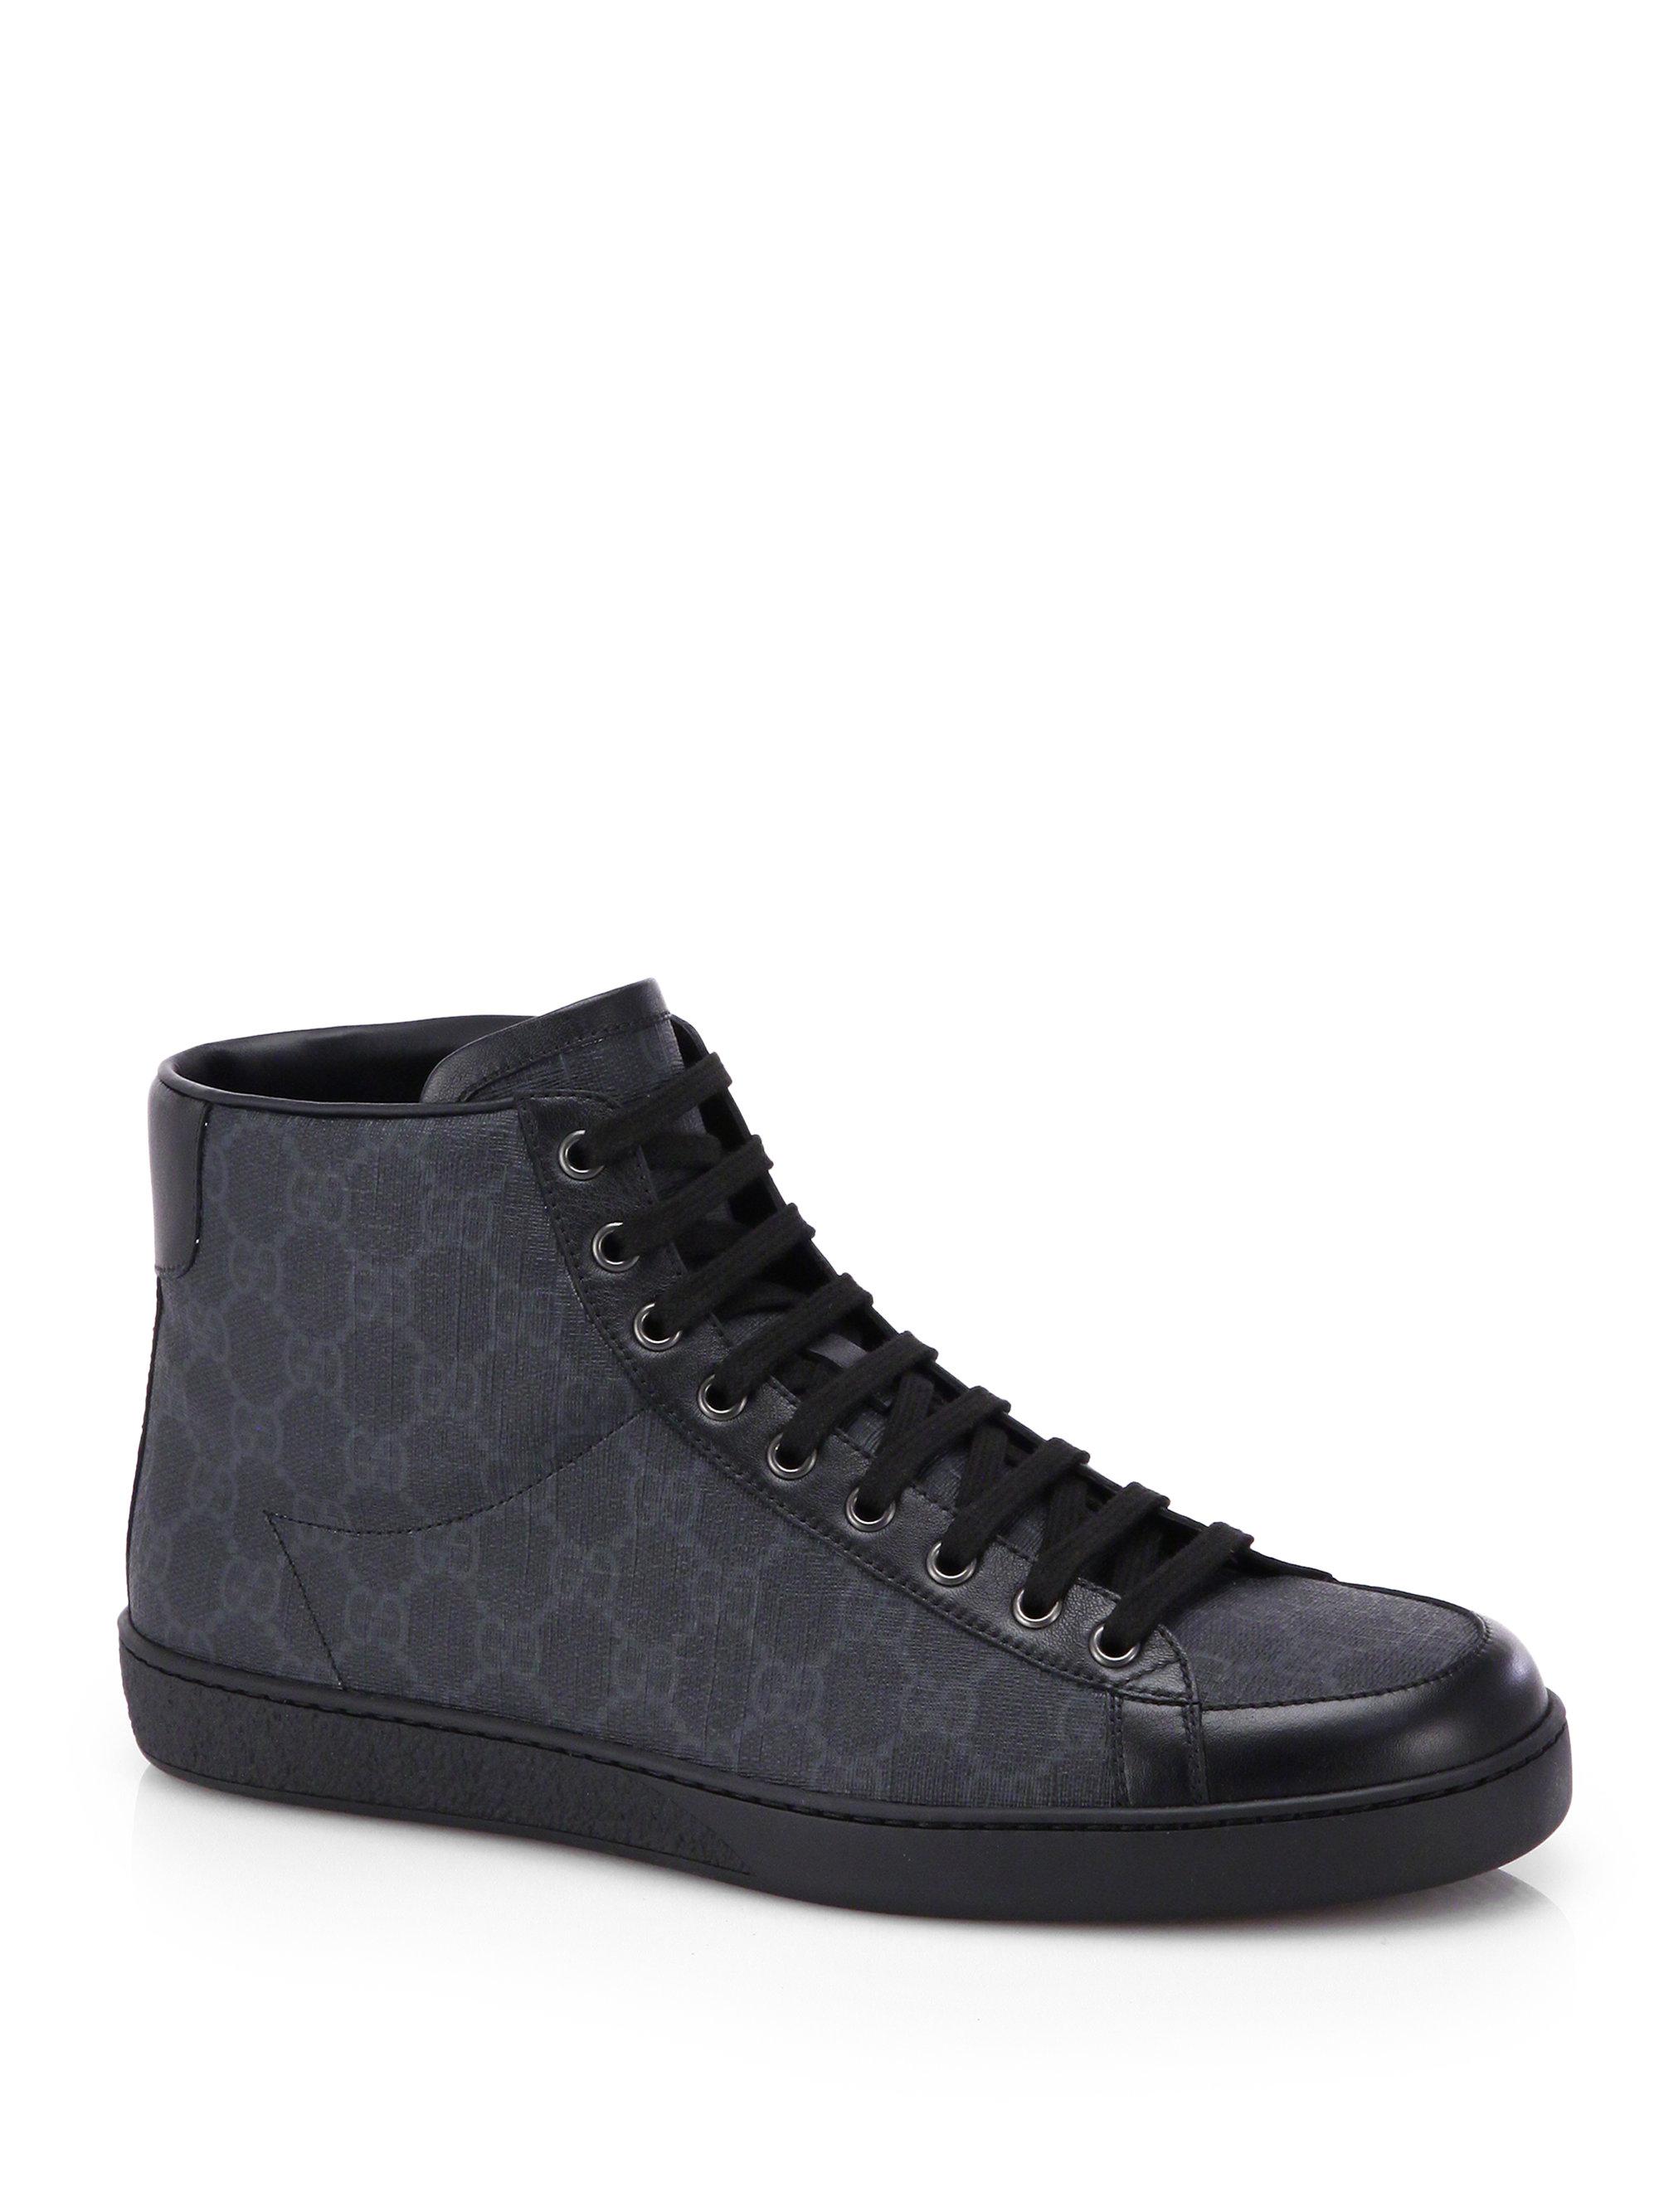 gucci gg supreme canvas high top sneaker in black for men. Black Bedroom Furniture Sets. Home Design Ideas